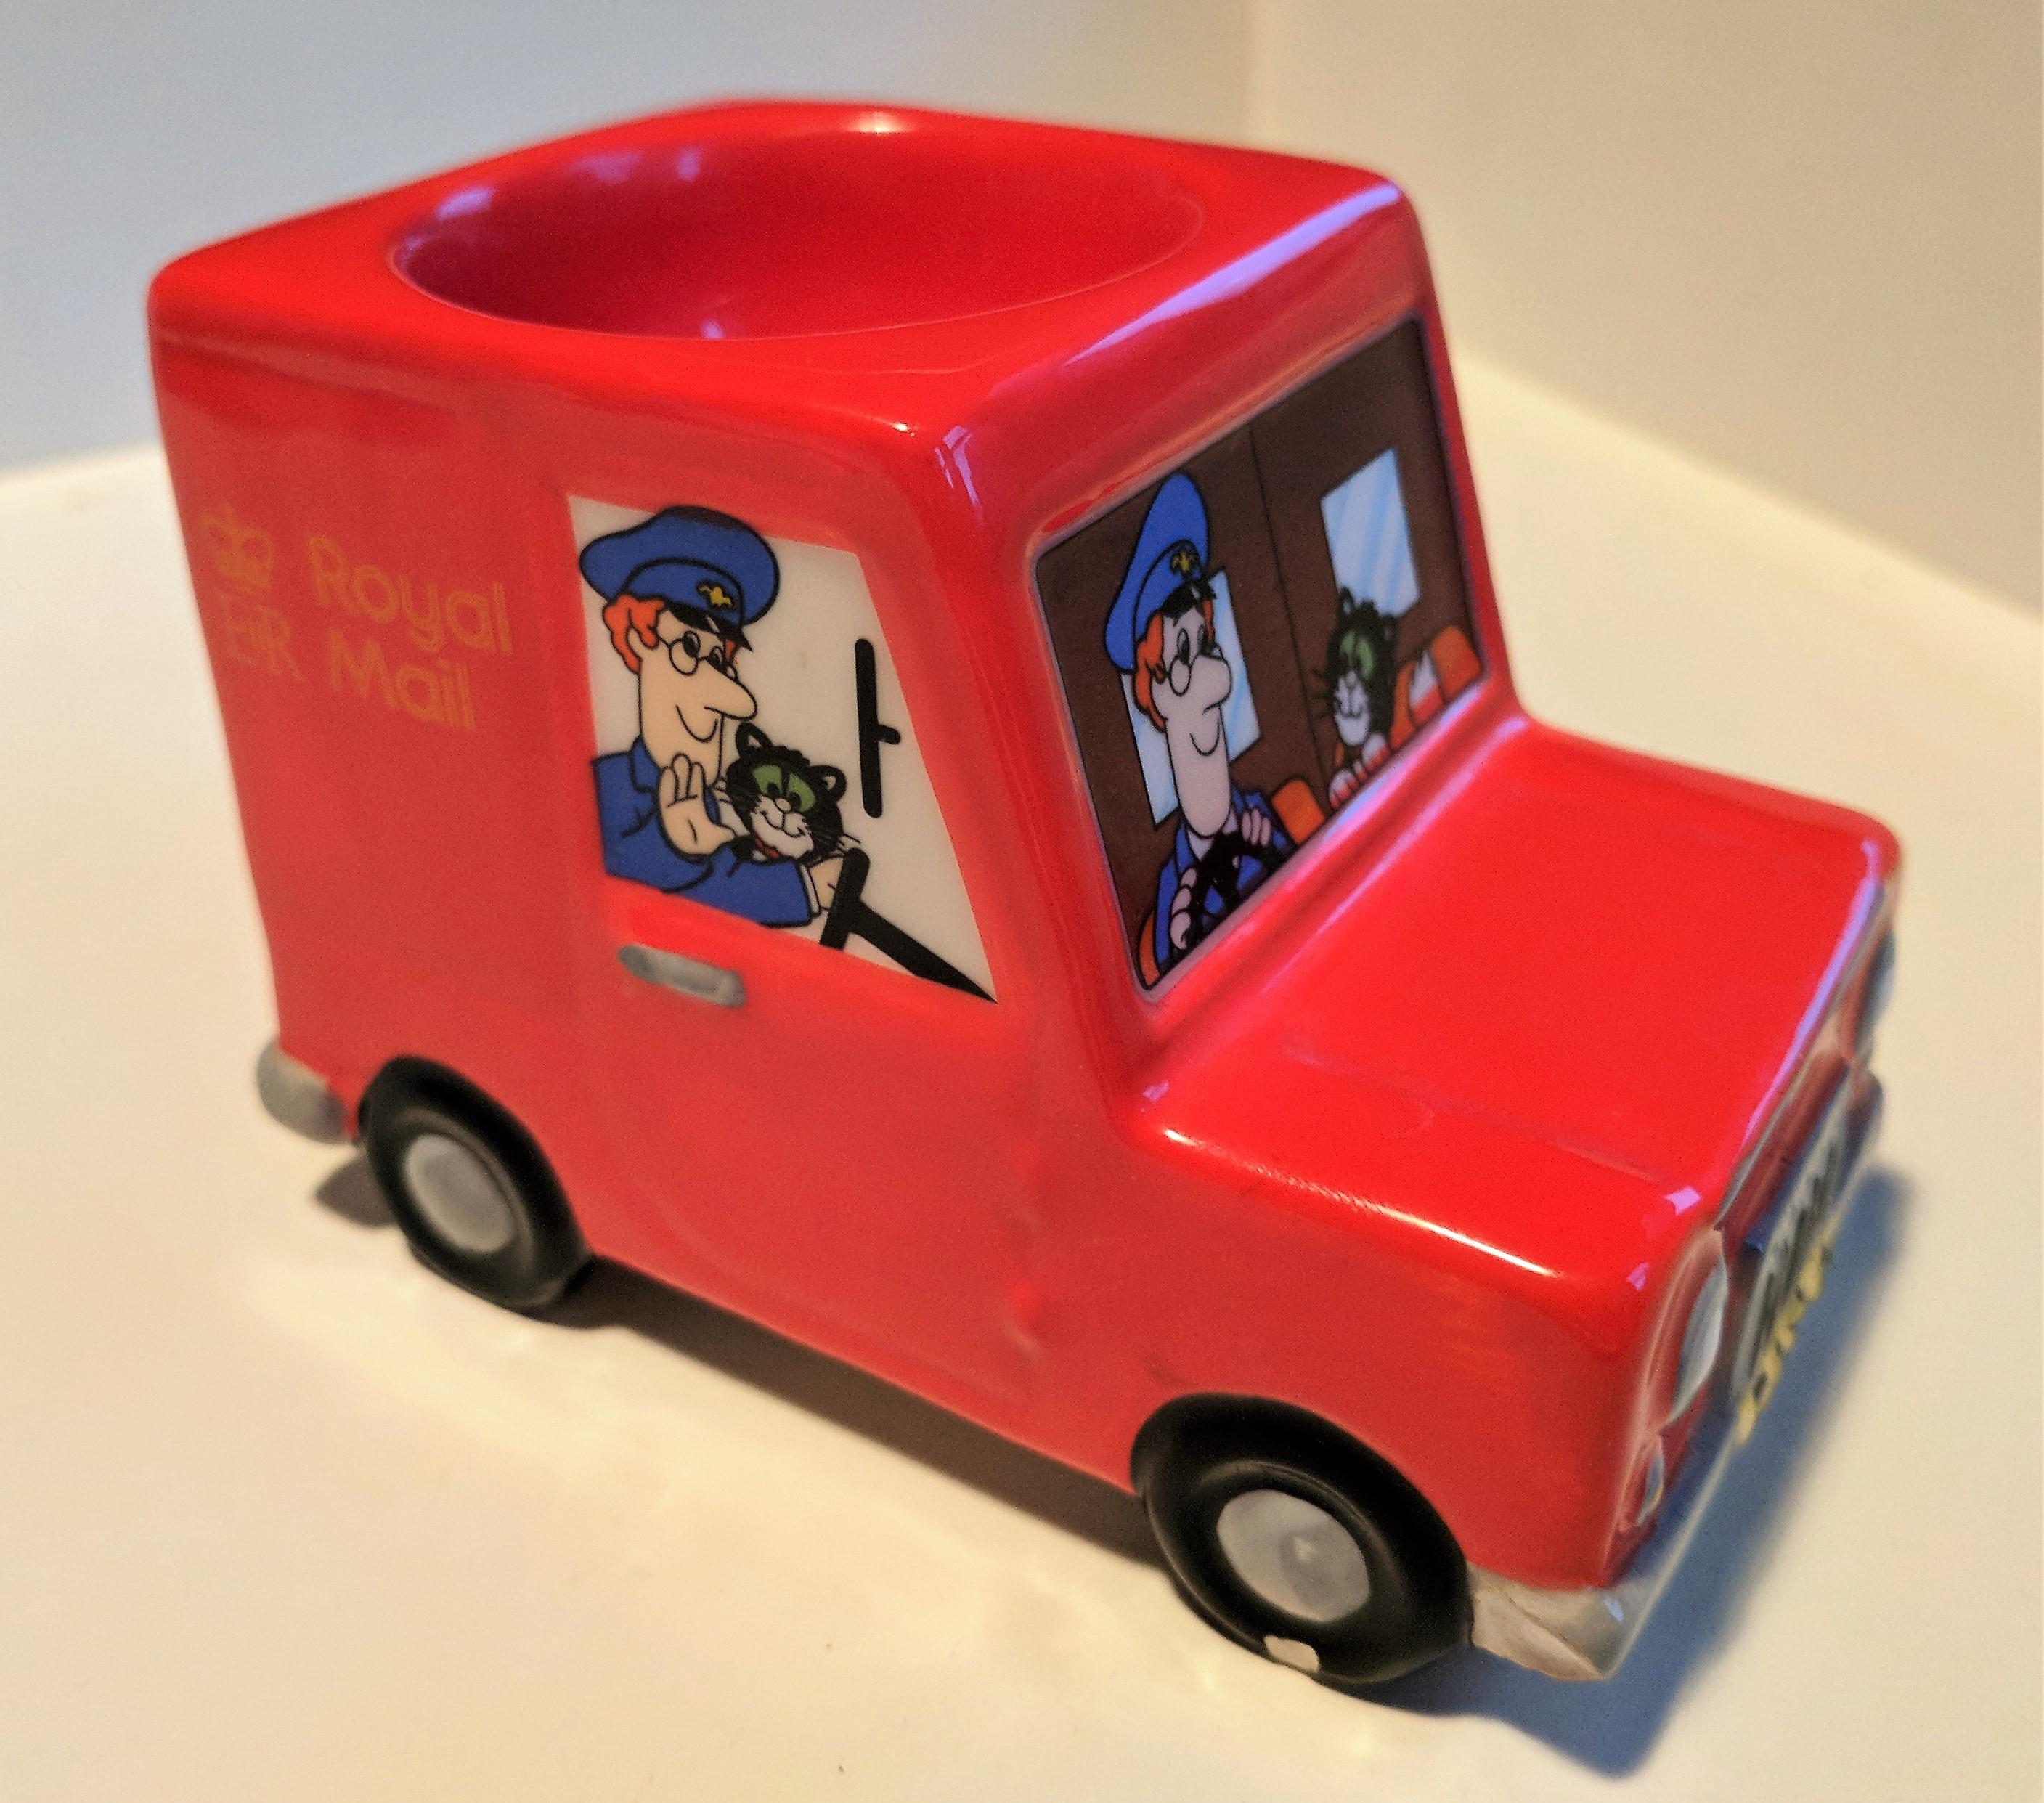 Postman Pat Egg Van